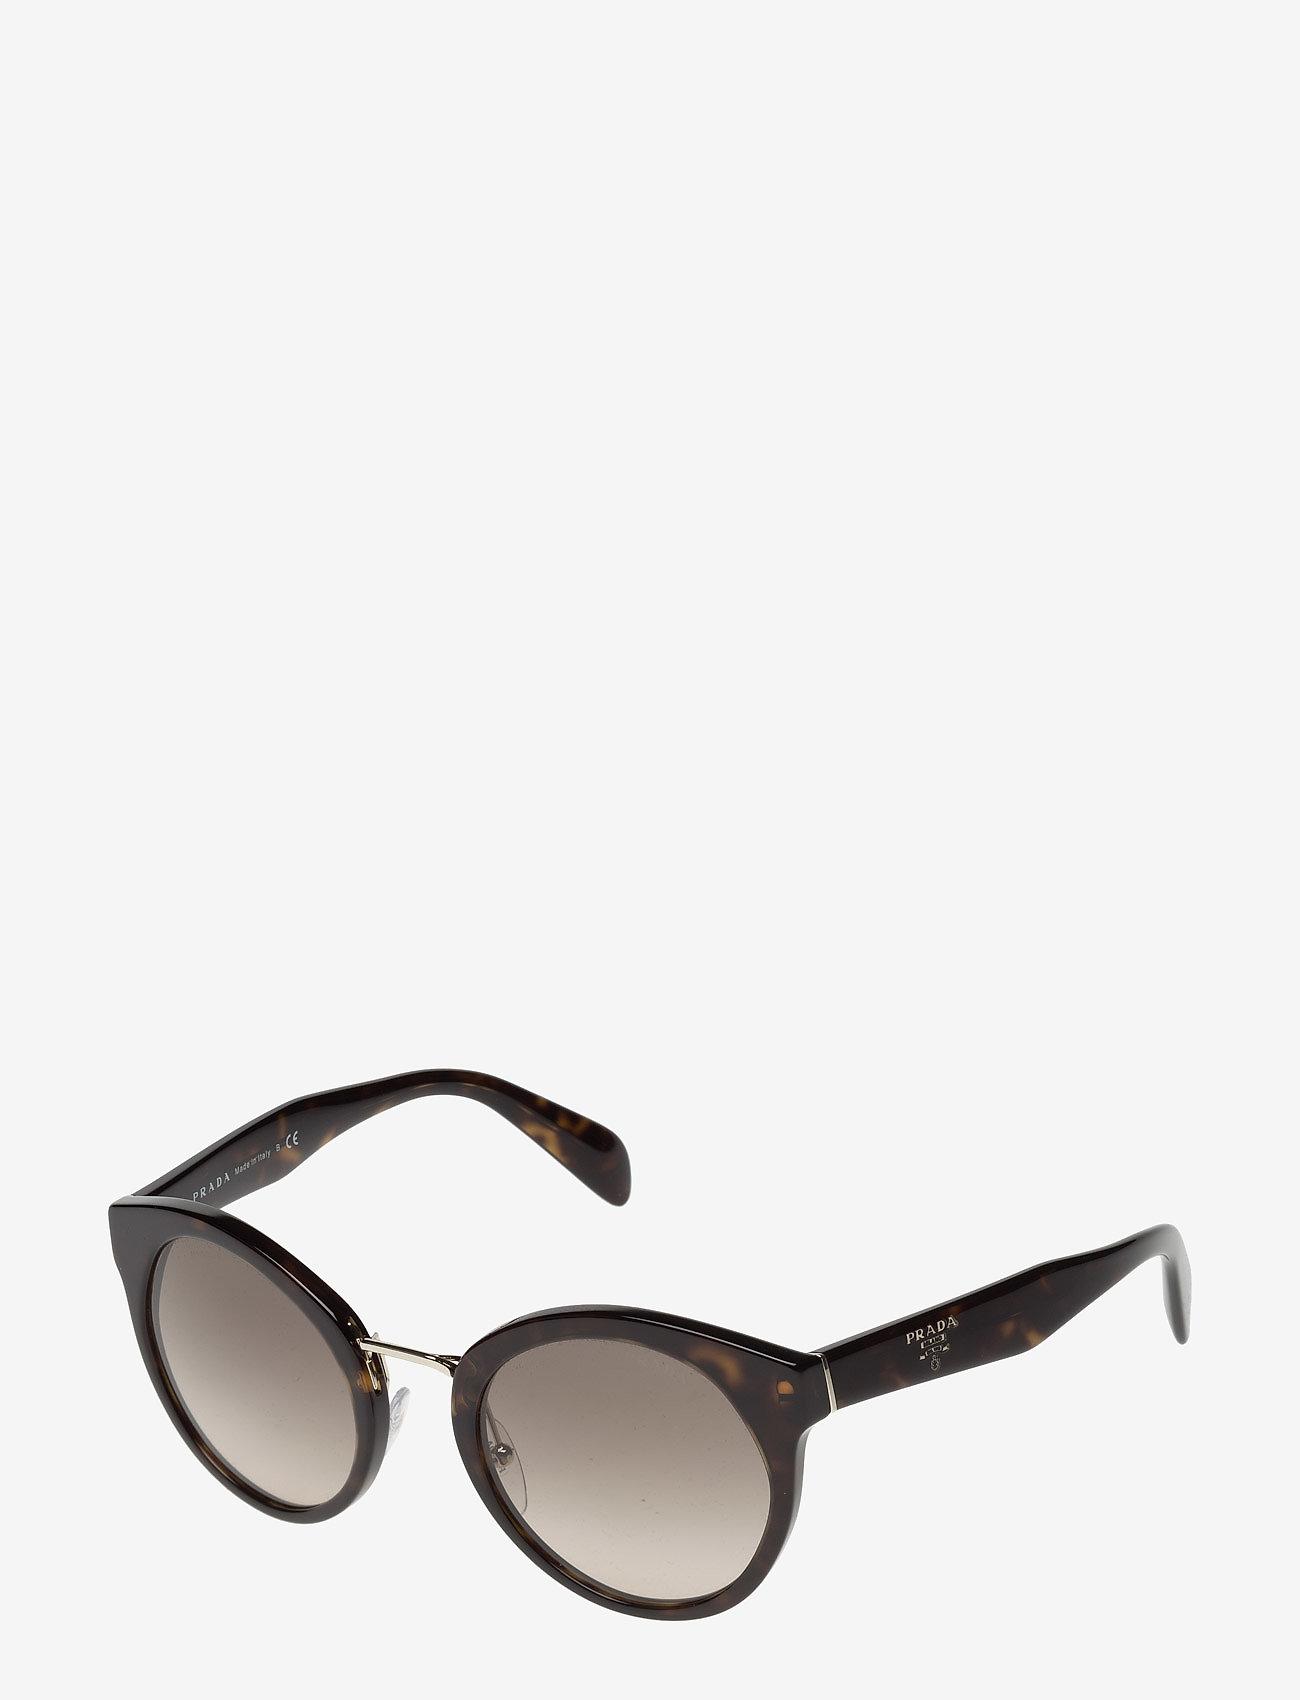 Prada Sunglasses - 0PR 05TS - rond model - havana - 1